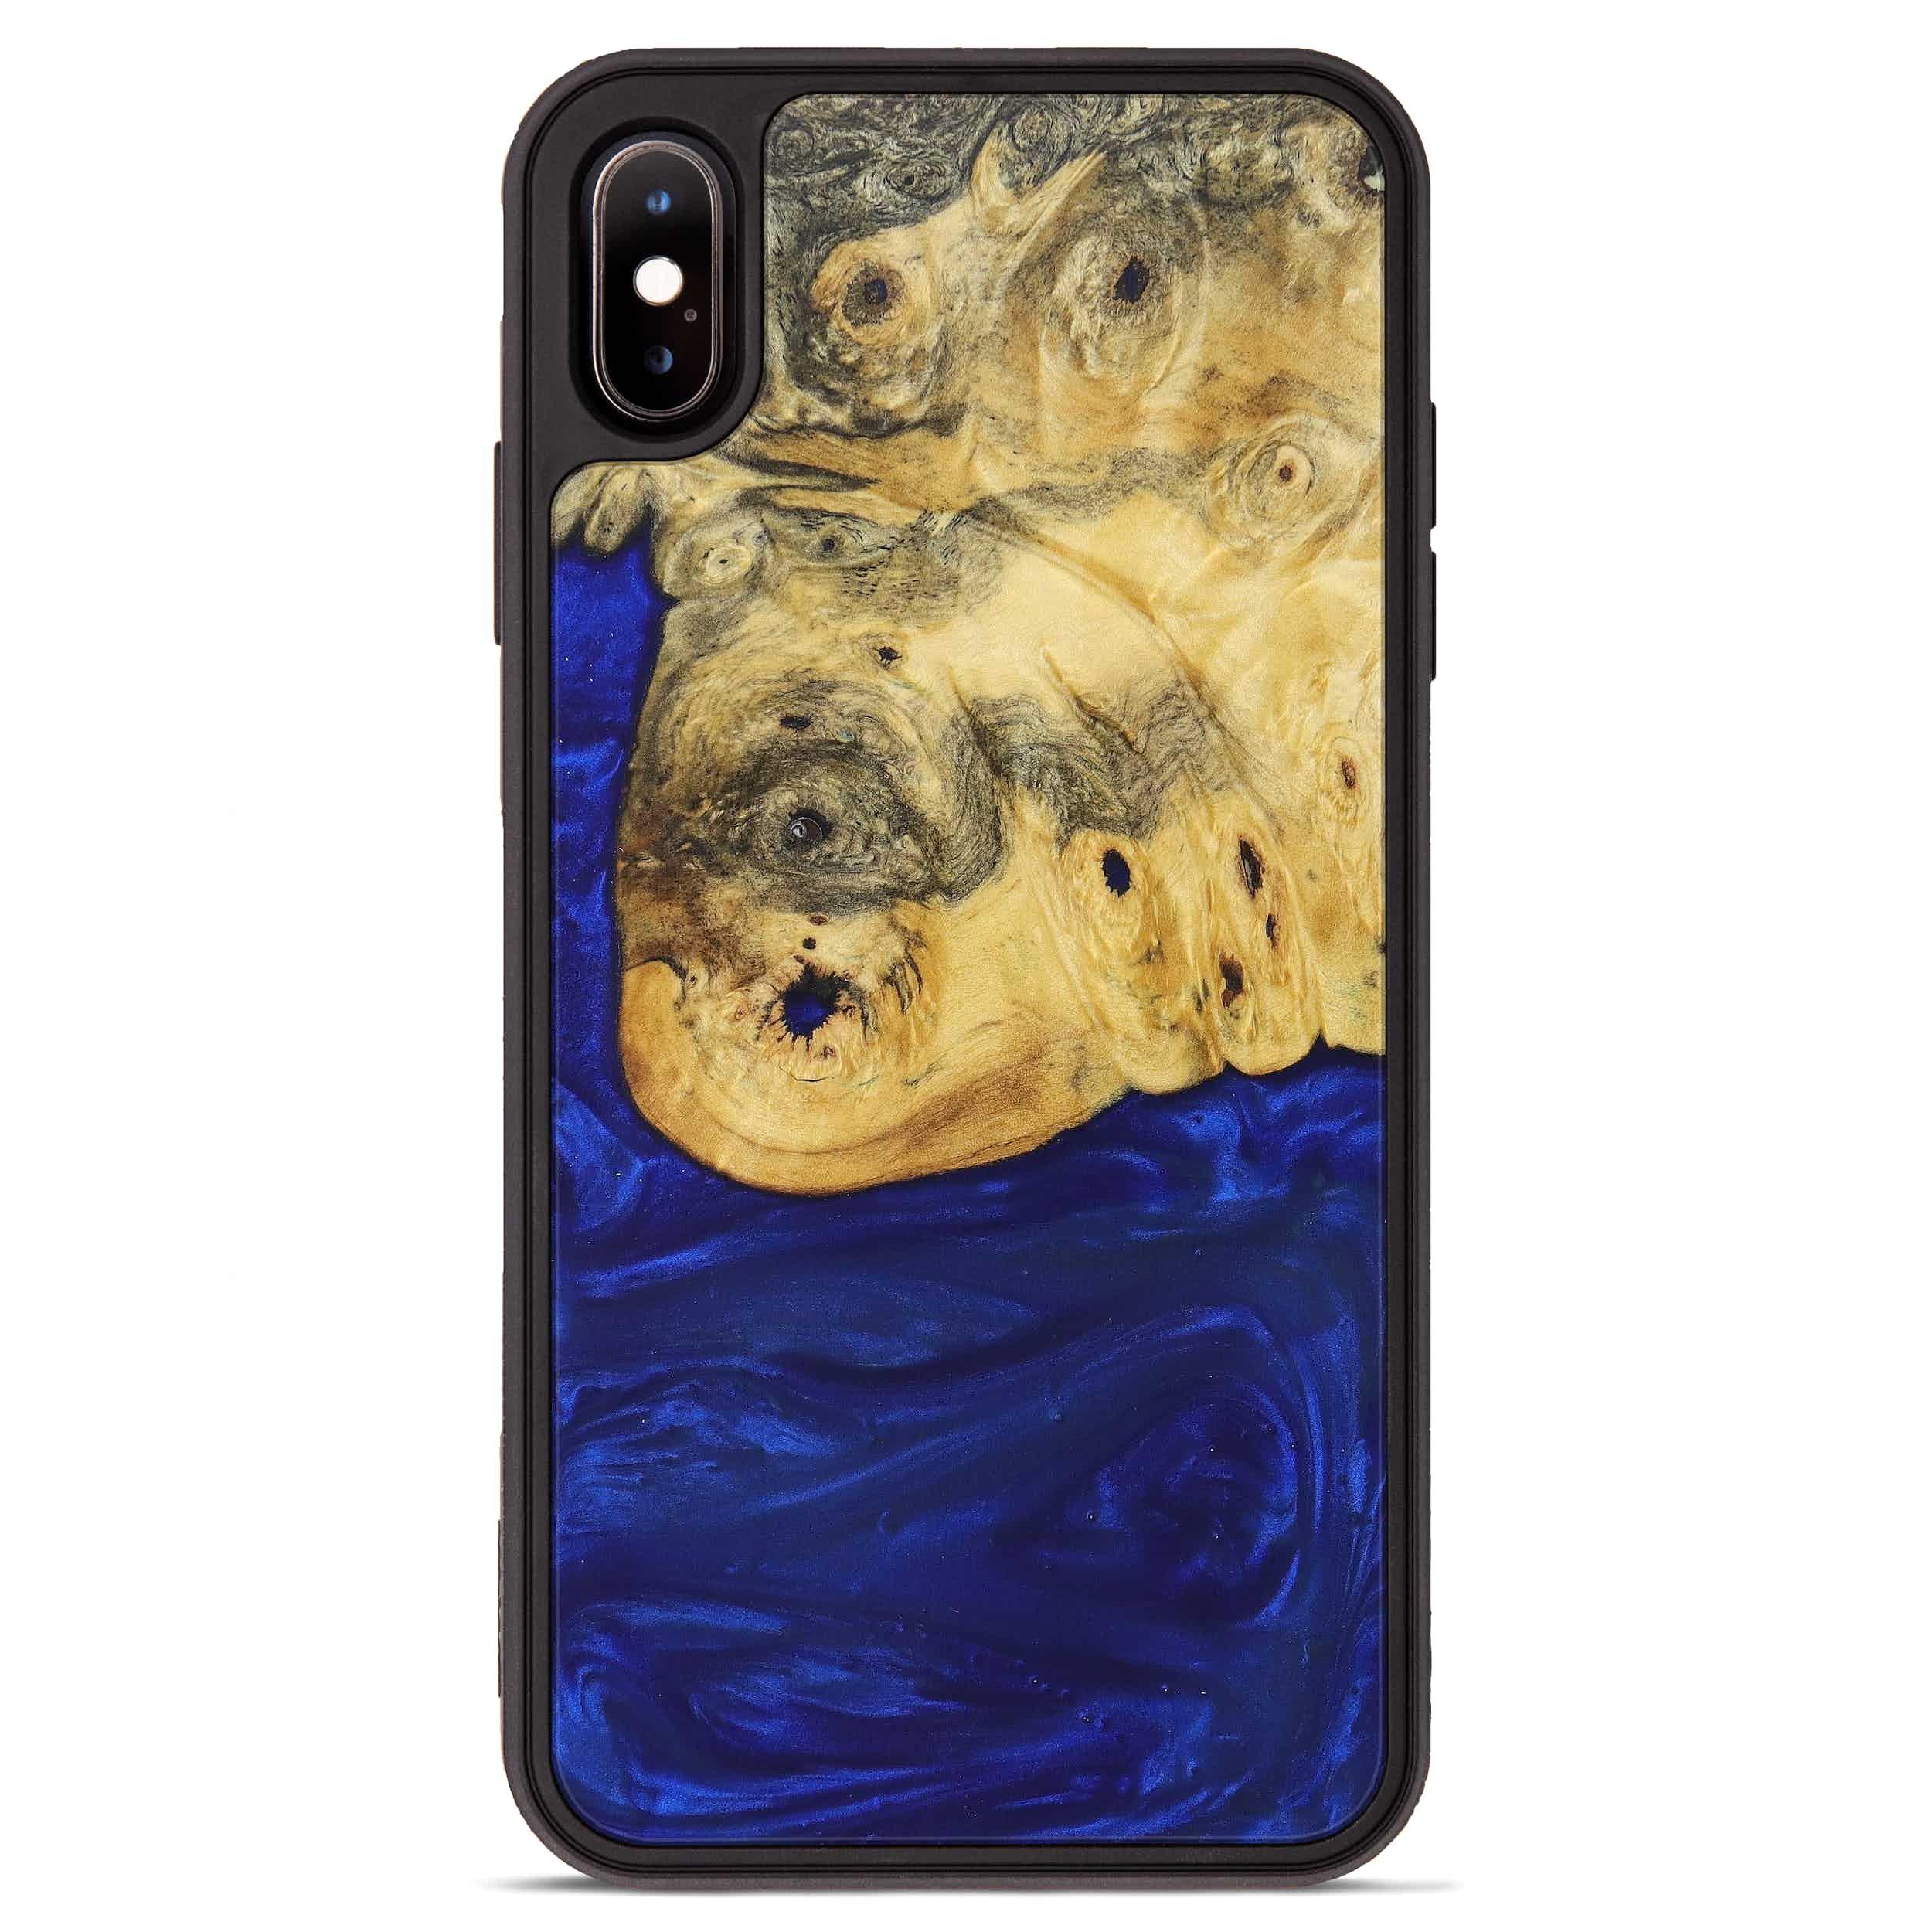 iPhone Xs Max Wood+Resin Phone Case - Loni (Dark Blue, 367198)